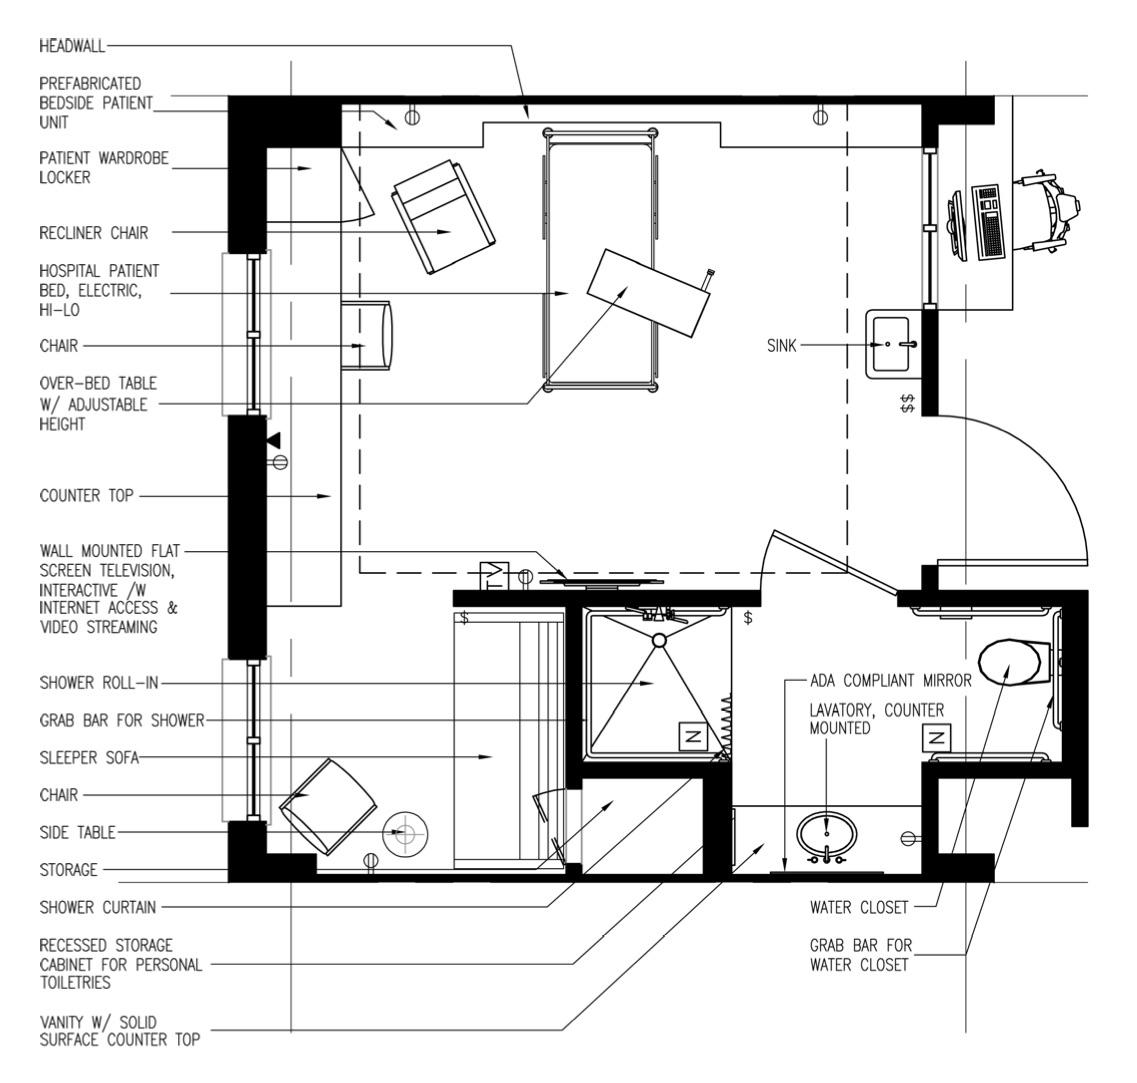 Inpatient Room, VA Polytrauma Rehabilitation Center Design Guide